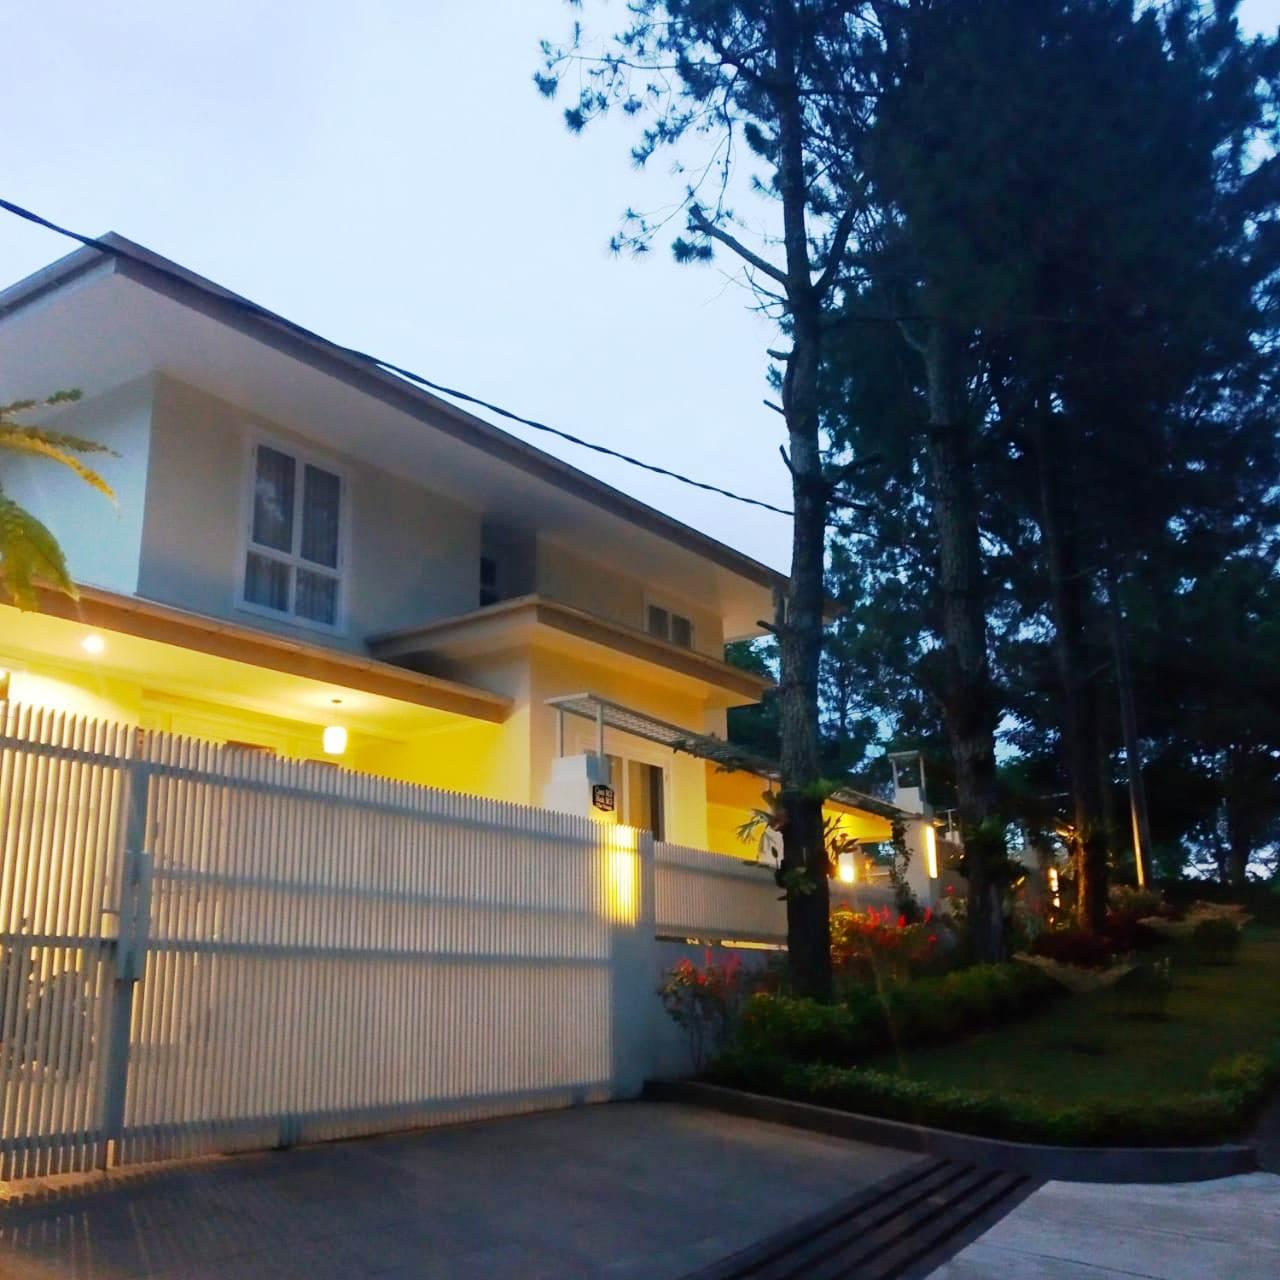 Harga Sewa Villa di Kampung Daun Trinity Lembang – Villa Ims no 18 2019